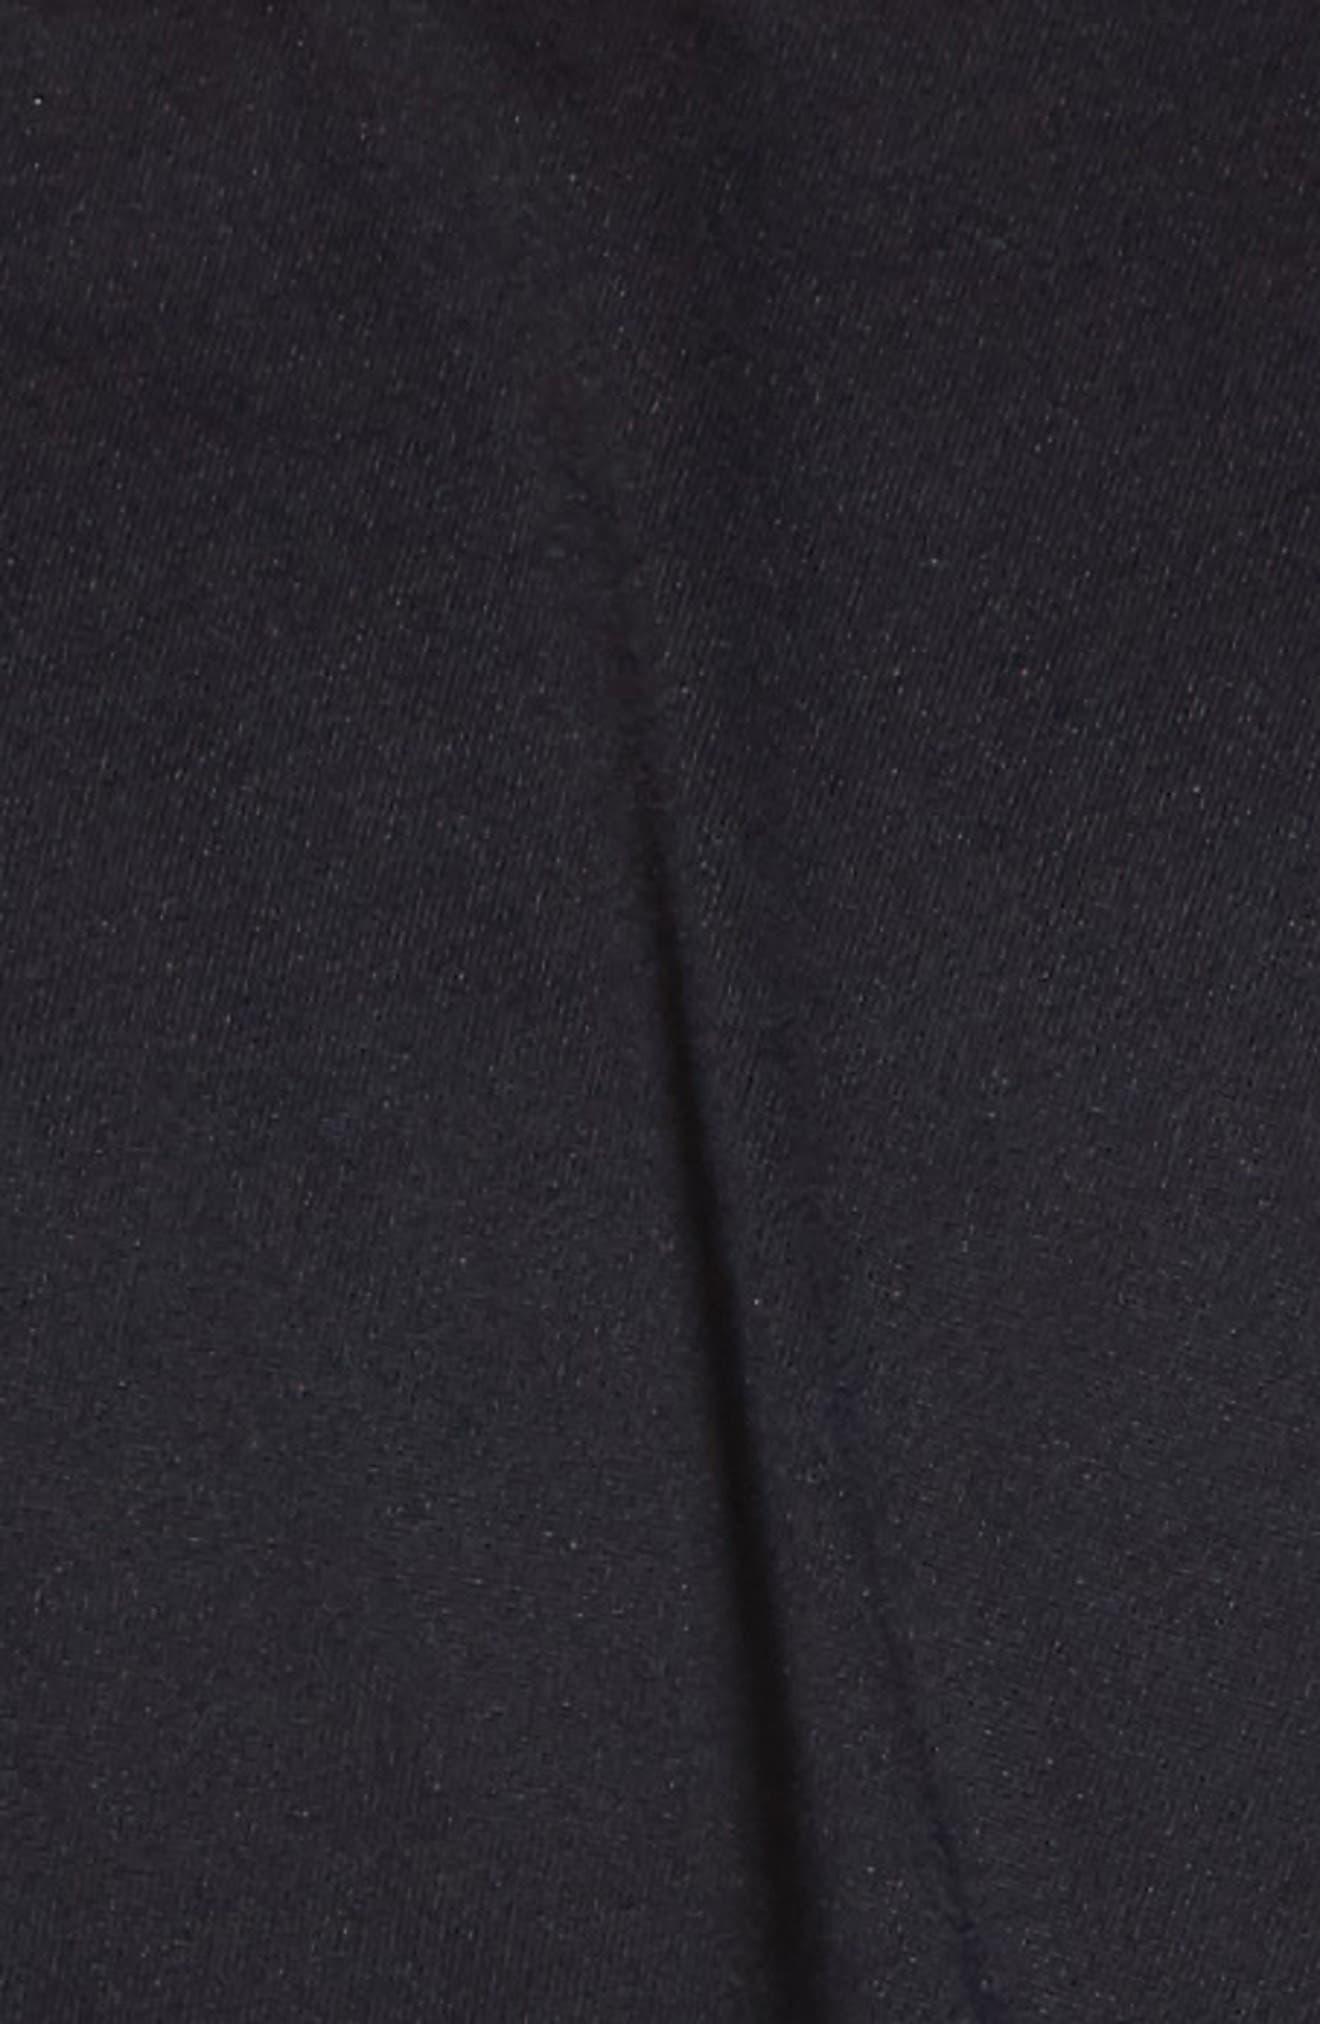 Off the Shoulder One-Piece Swimsuit,                             Alternate thumbnail 6, color,                             Black